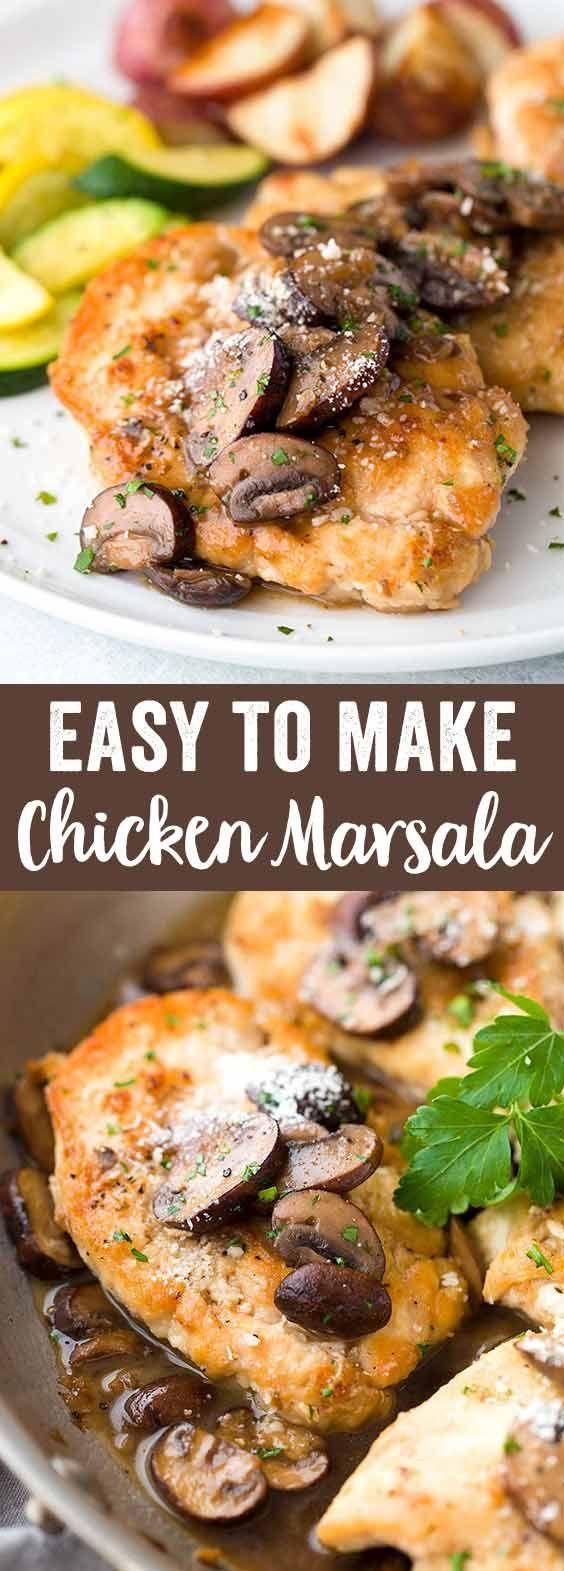 Easy Chicken Marsala Recipe - A classic Italian favorite, served with sautéed mushrooms and a delicious marsala wine sauce. via @foodiegavin